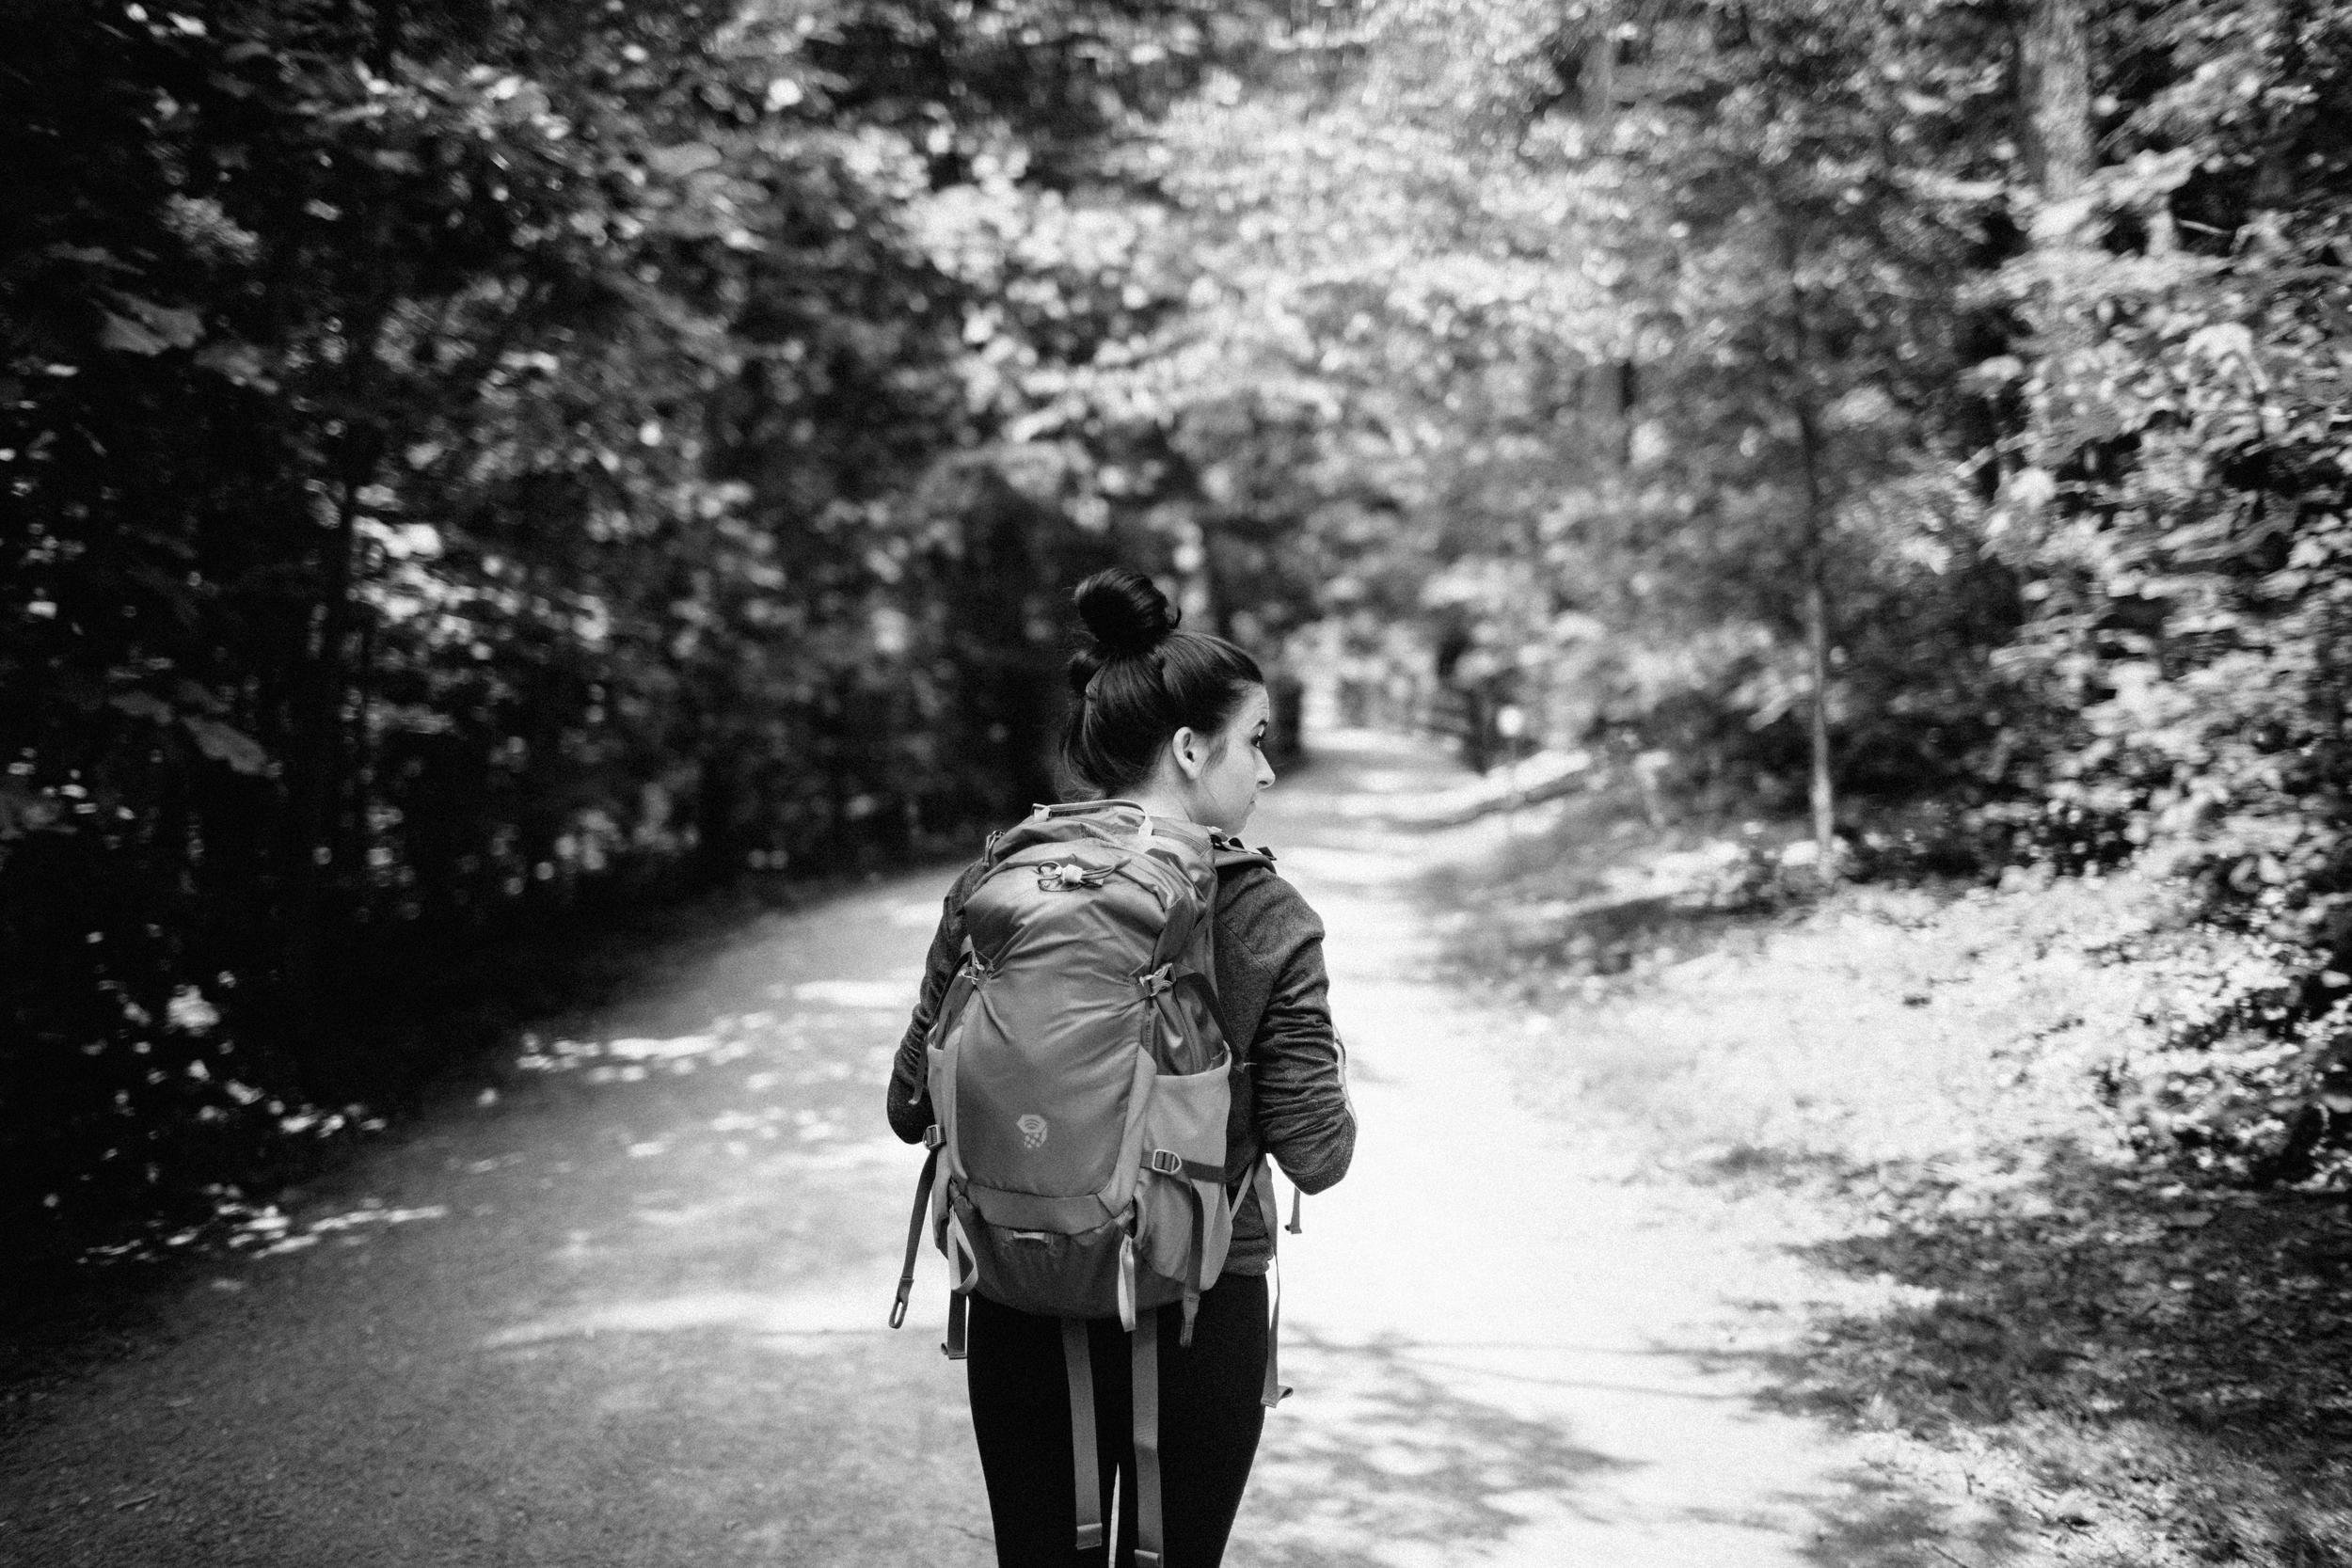 cheyenne kody NR MHW backpack-17.jpg